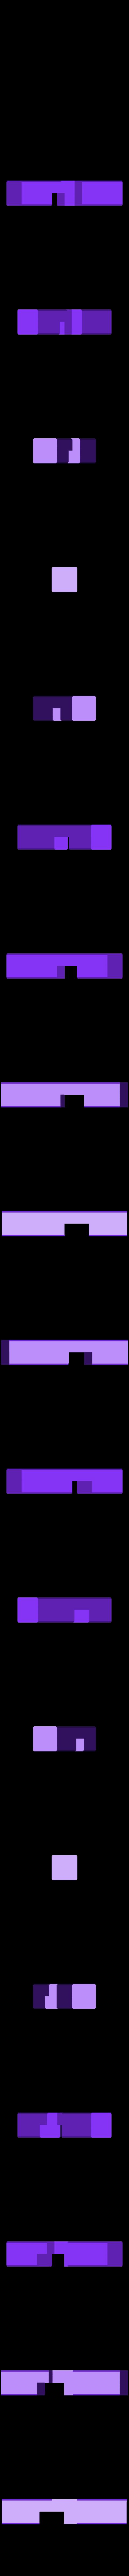 I.stl Download free STL file Mini Puzzle Puzzle • 3D printer model, Bdz37